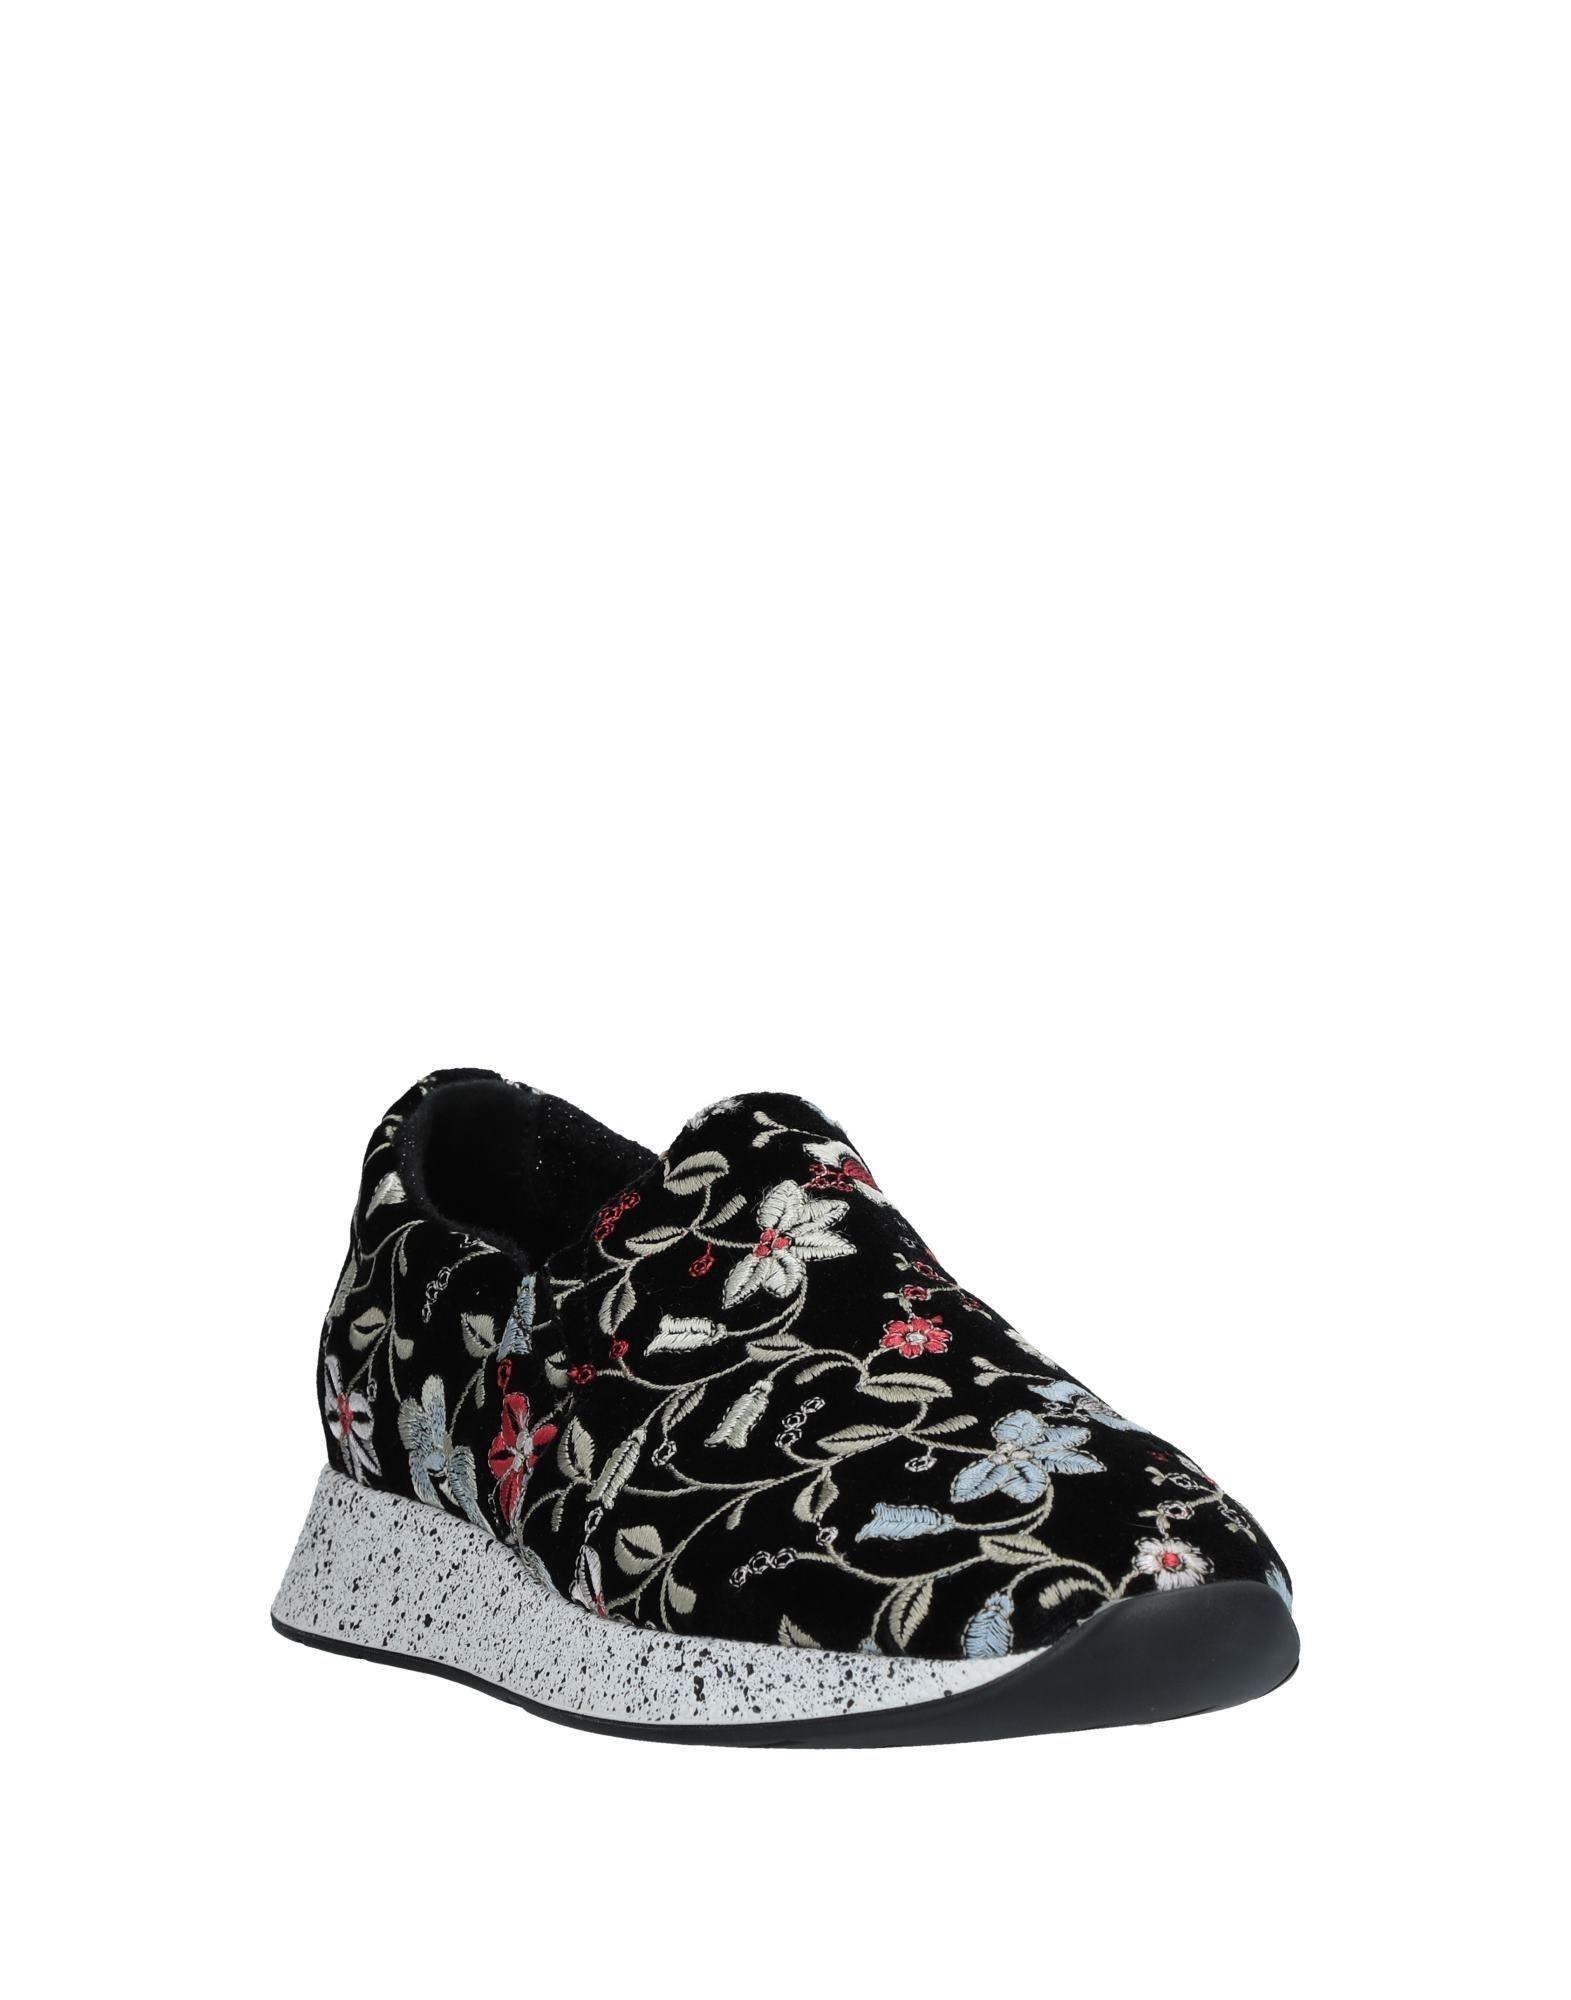 Frau Gute Sneakers Damen  11533962FM Gute Frau Qualität beliebte Schuhe 2324f5